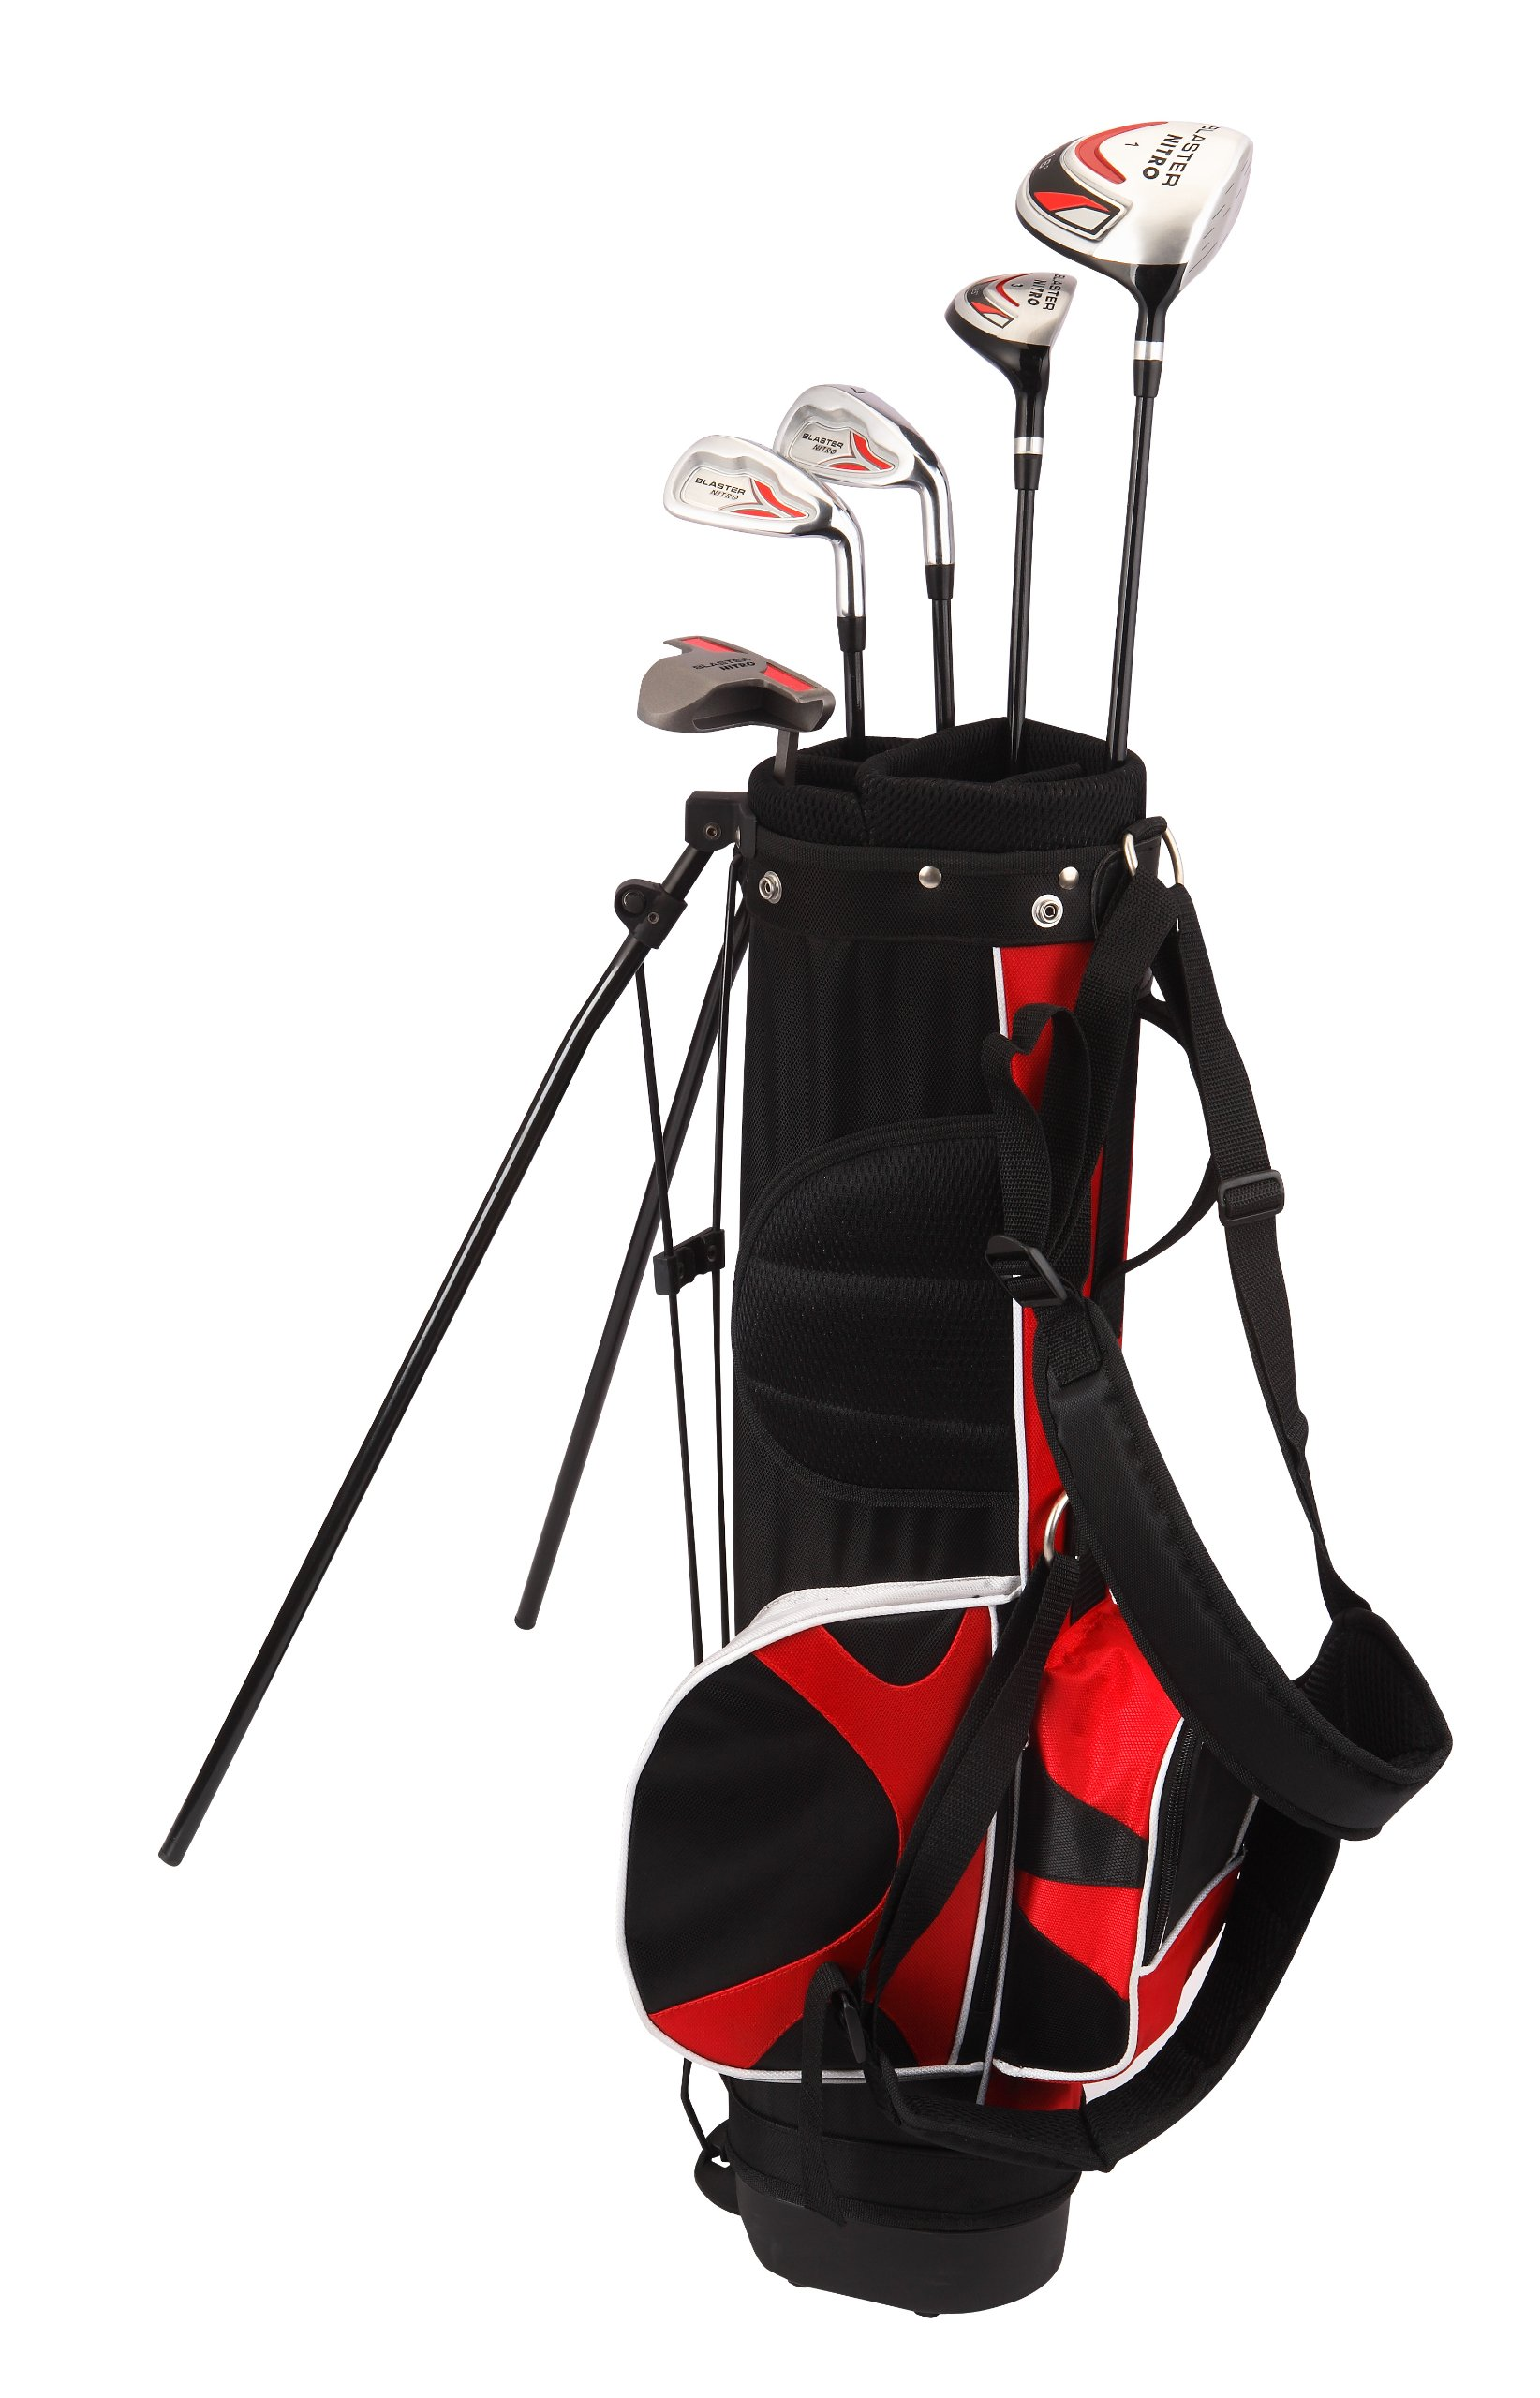 Kid's Right-Handed 8 Piece Golf Club Set - Nitro Blaster Kid's Golf Set - 31 Inch Graphite 15-Degree Regular with Bag 9-12 years by Nitro